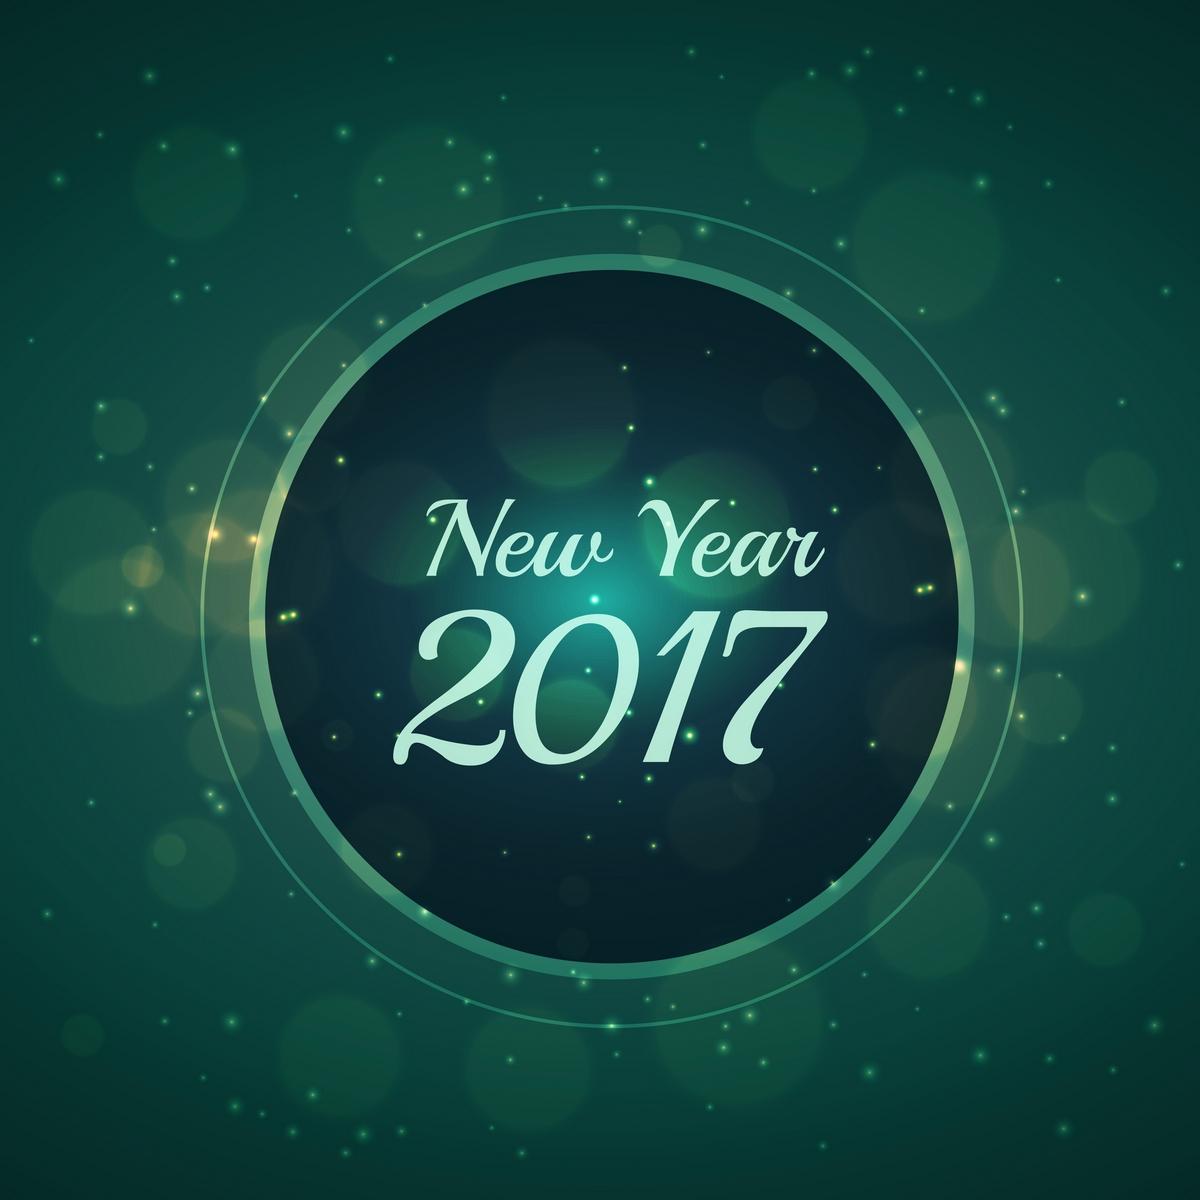 Best Happy New Year 2017 3D Wallpaper Download